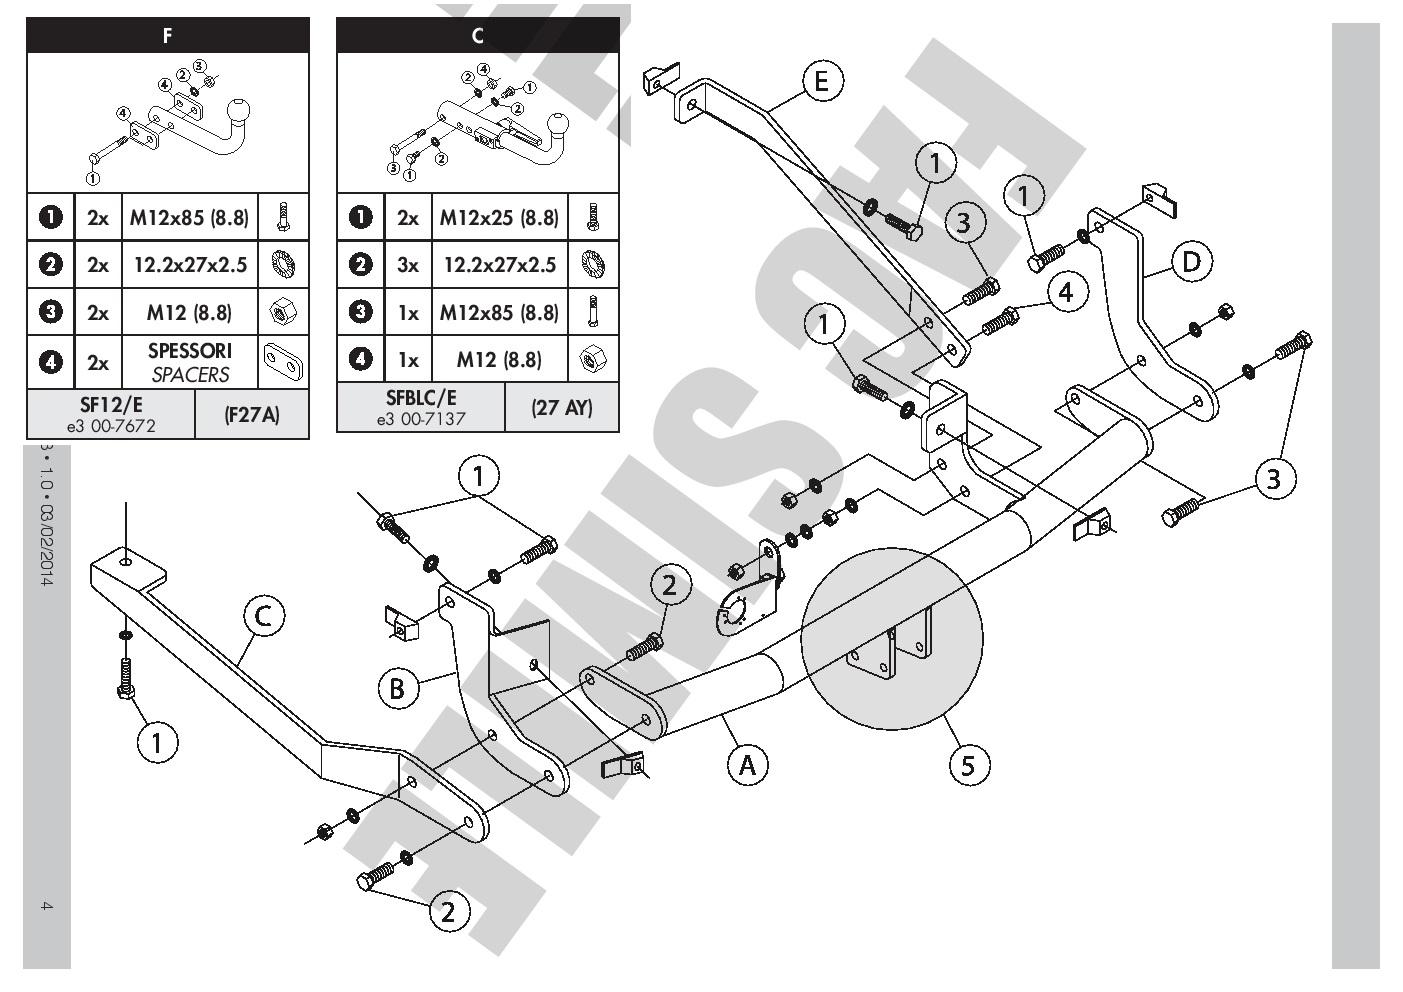 swan neck towbar for peugeot expert 7 pin bypass relay 94 f h7